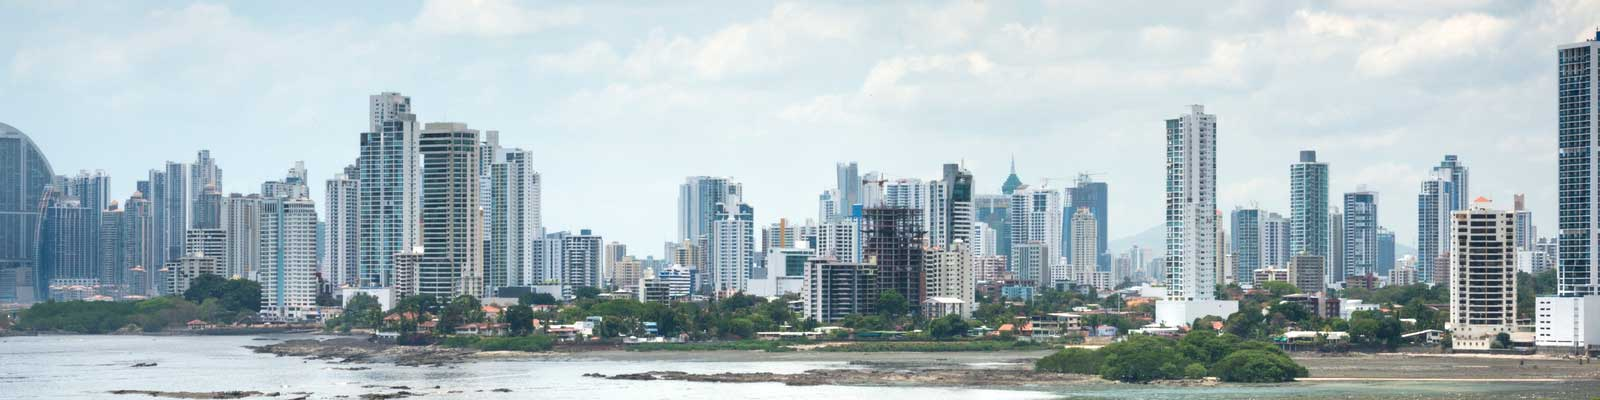 Panama carousel 2